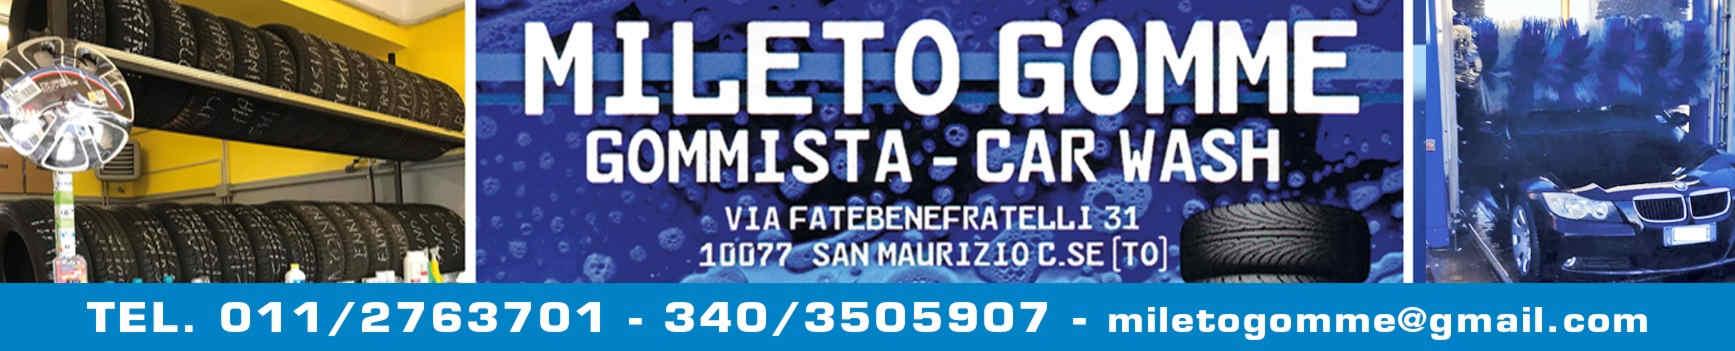 mileto-gomme-banner-gommista-rivista-promuovere